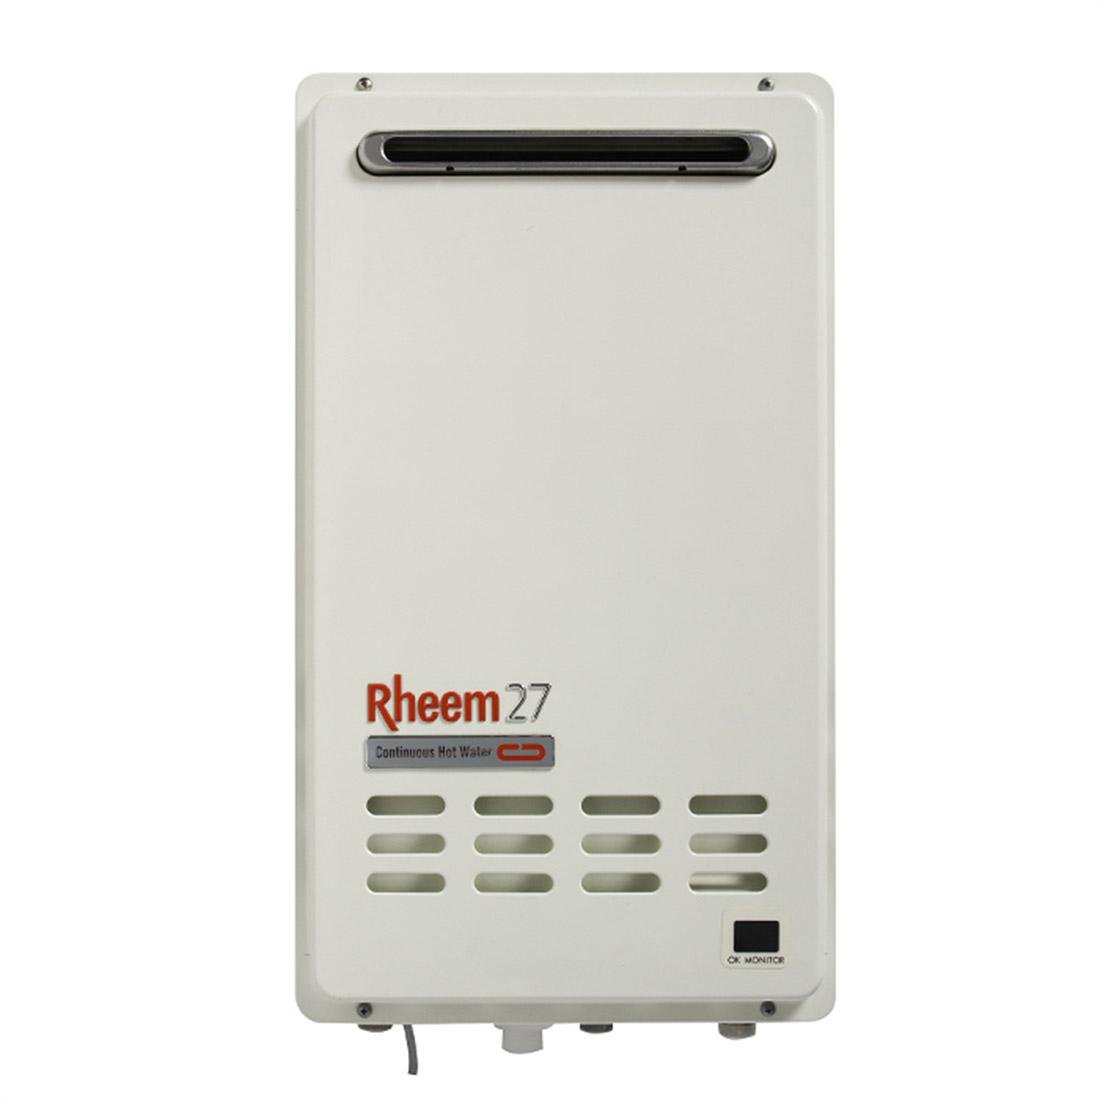 Rheem 874 Series Integrity Continuous Flow ULPG Gas Water Heater 27L Outdoor 6 Star 874627LPZ